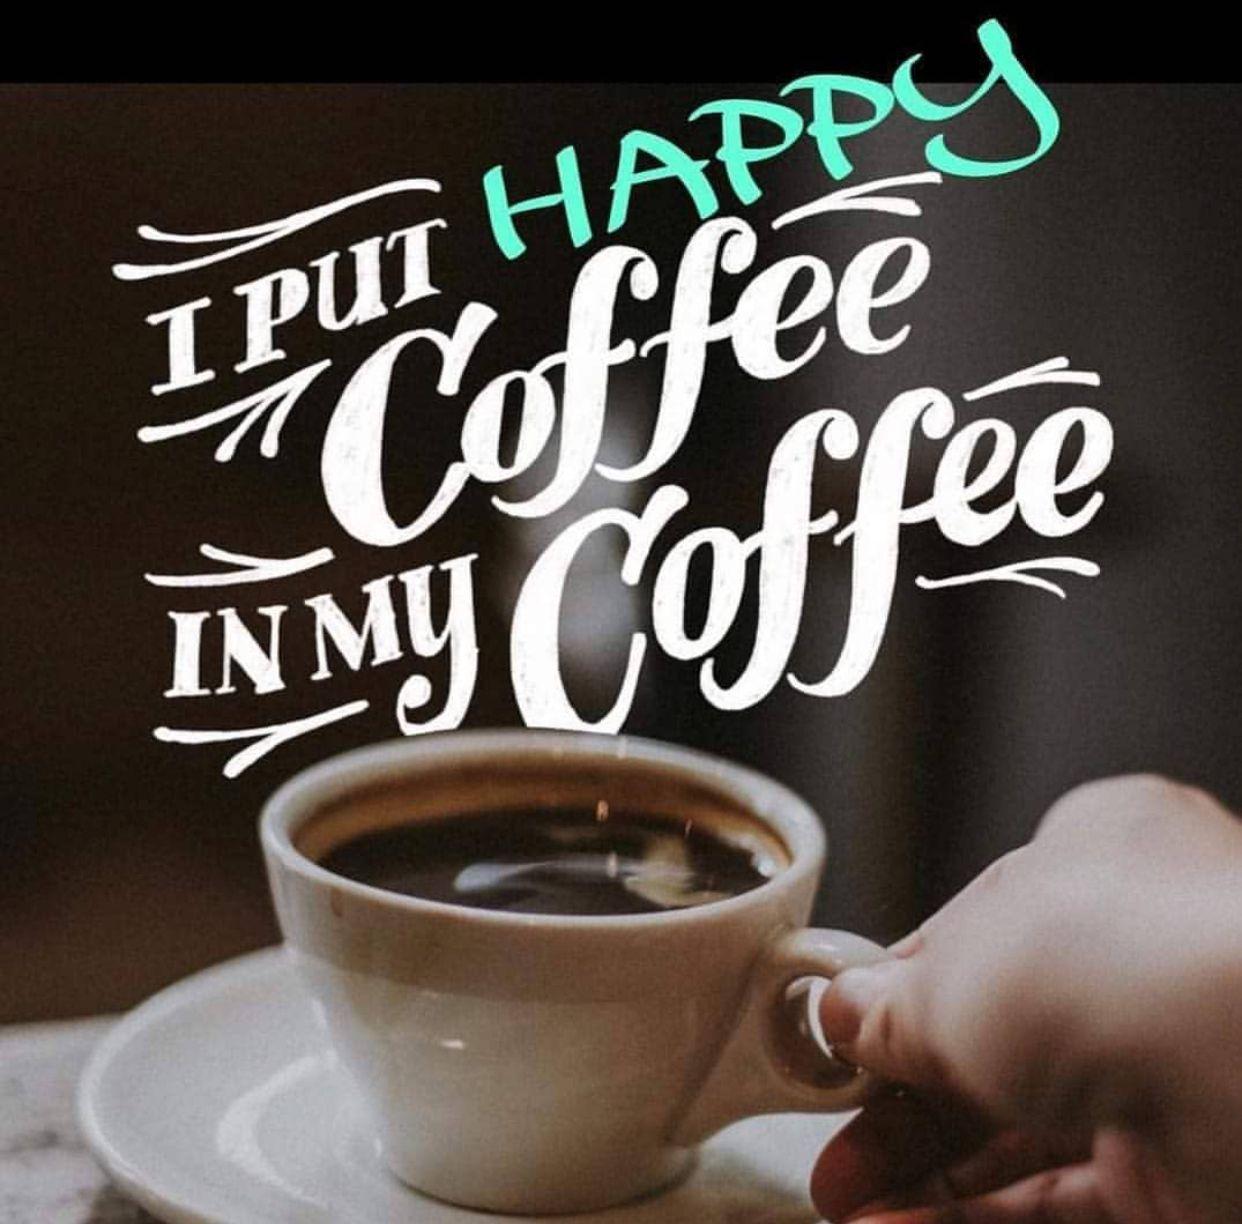 Pin by Mindie Klar on Happy Coffee in 2020 Happy coffee